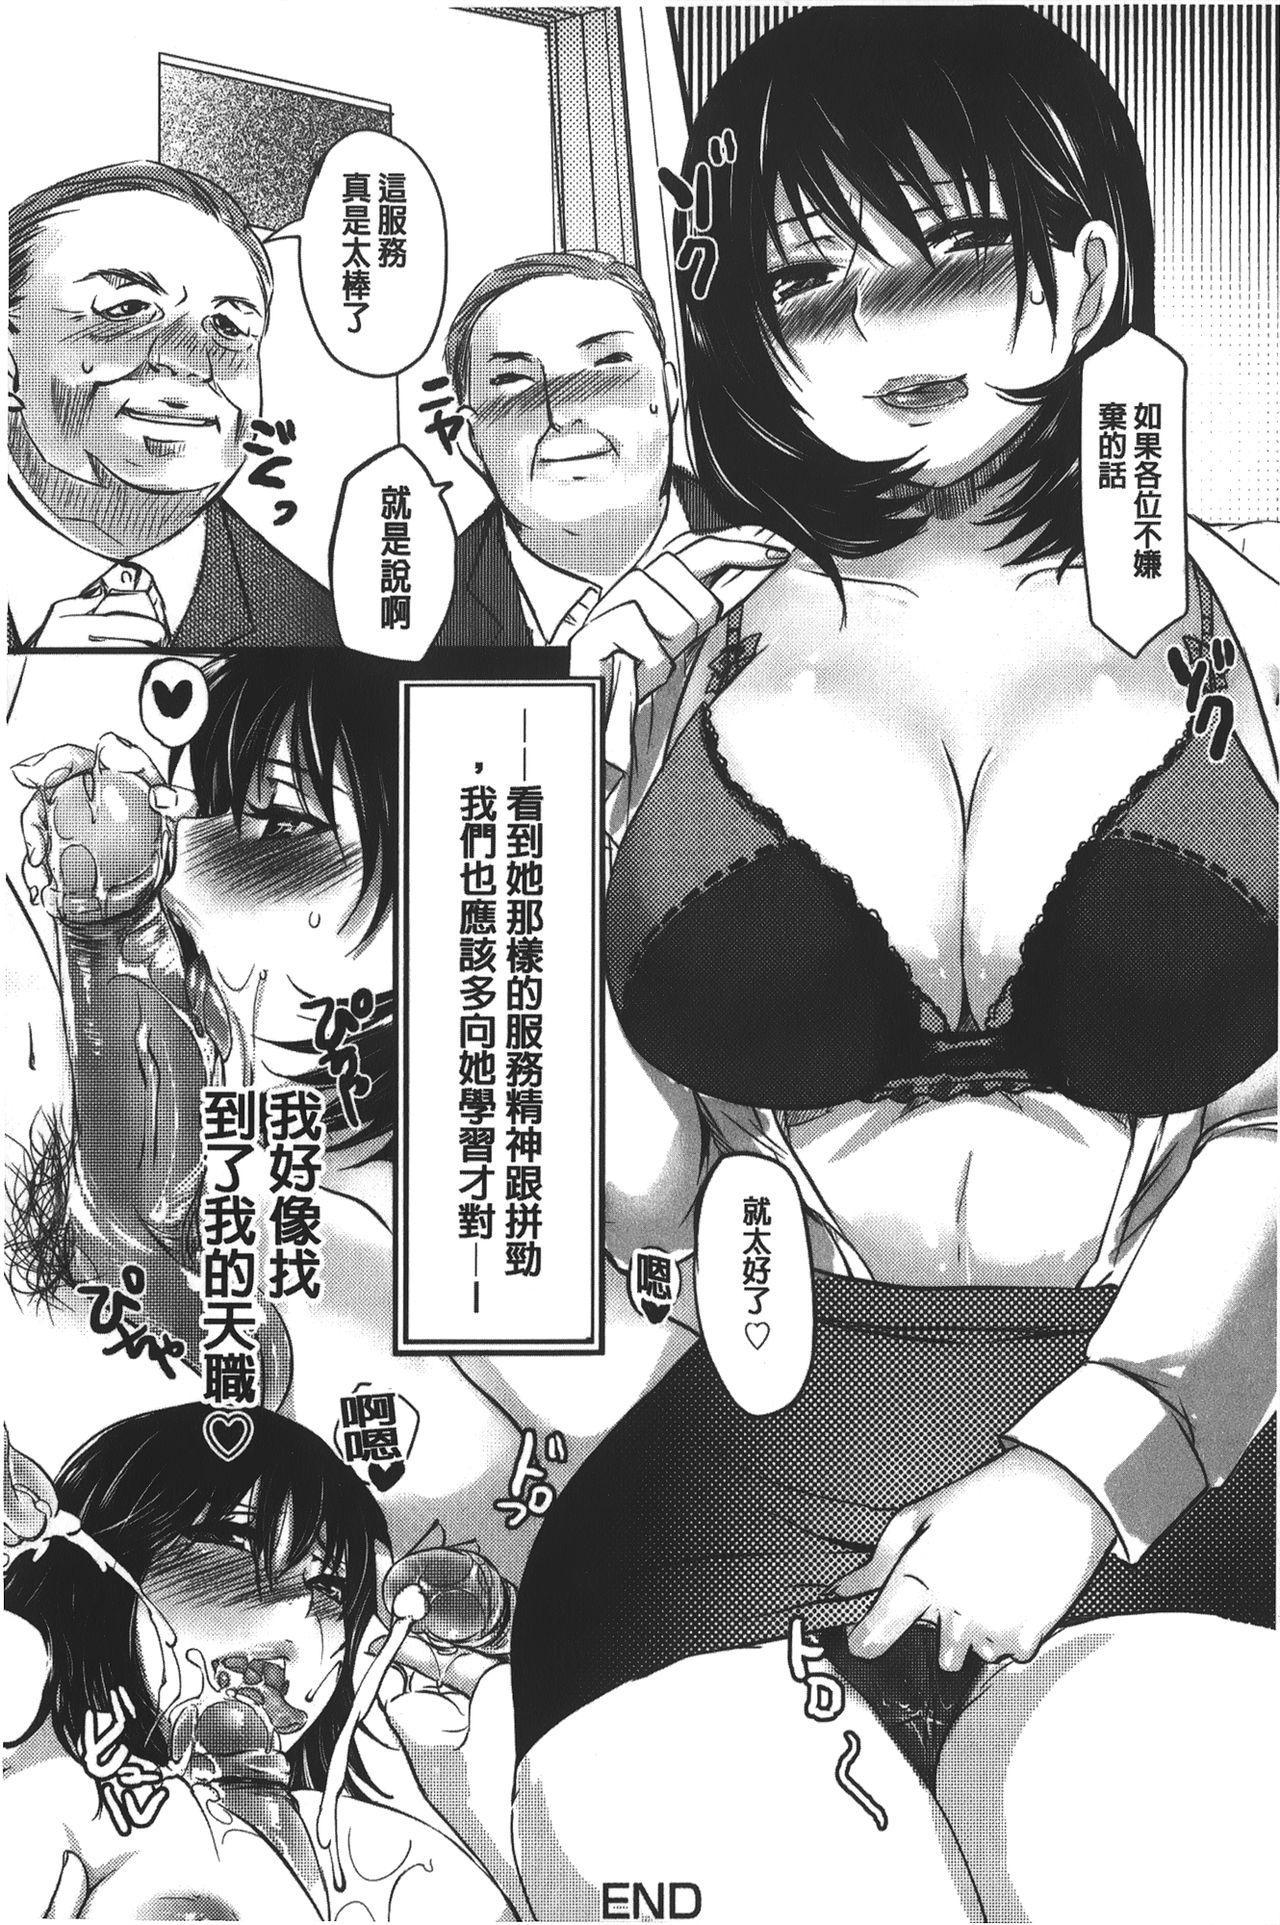 Kanjuku Torozuma 30